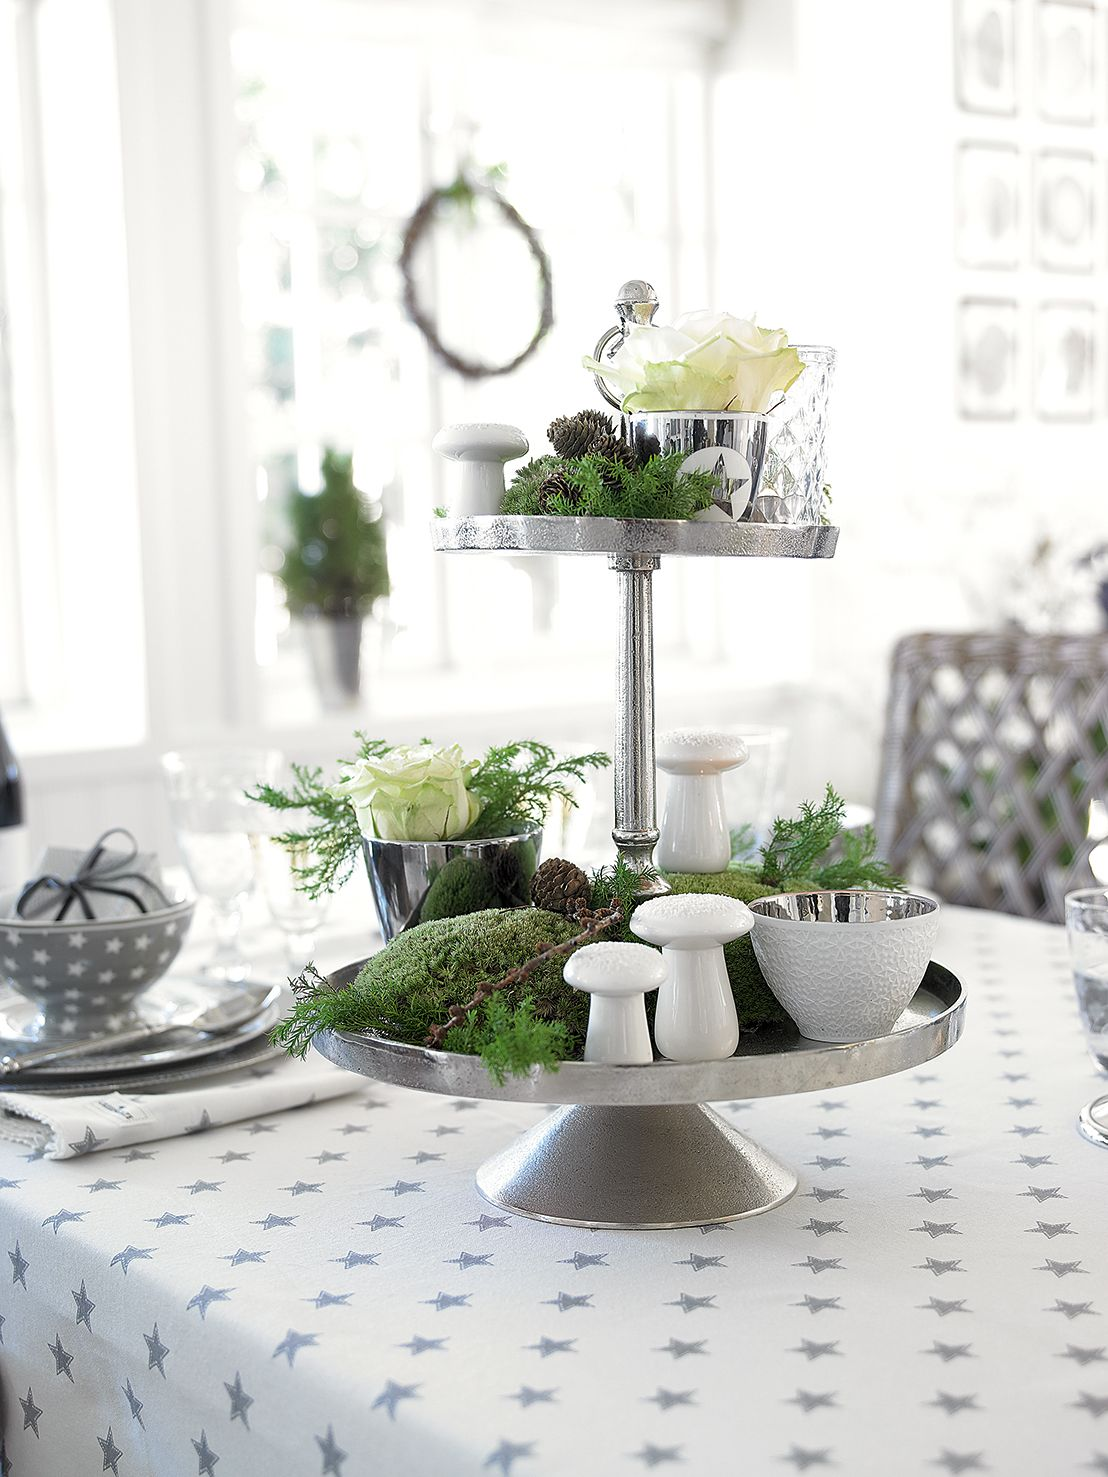 etagere aus metall silber green gate herbst winter 2014 2015 pinterest herbst herbst. Black Bedroom Furniture Sets. Home Design Ideas